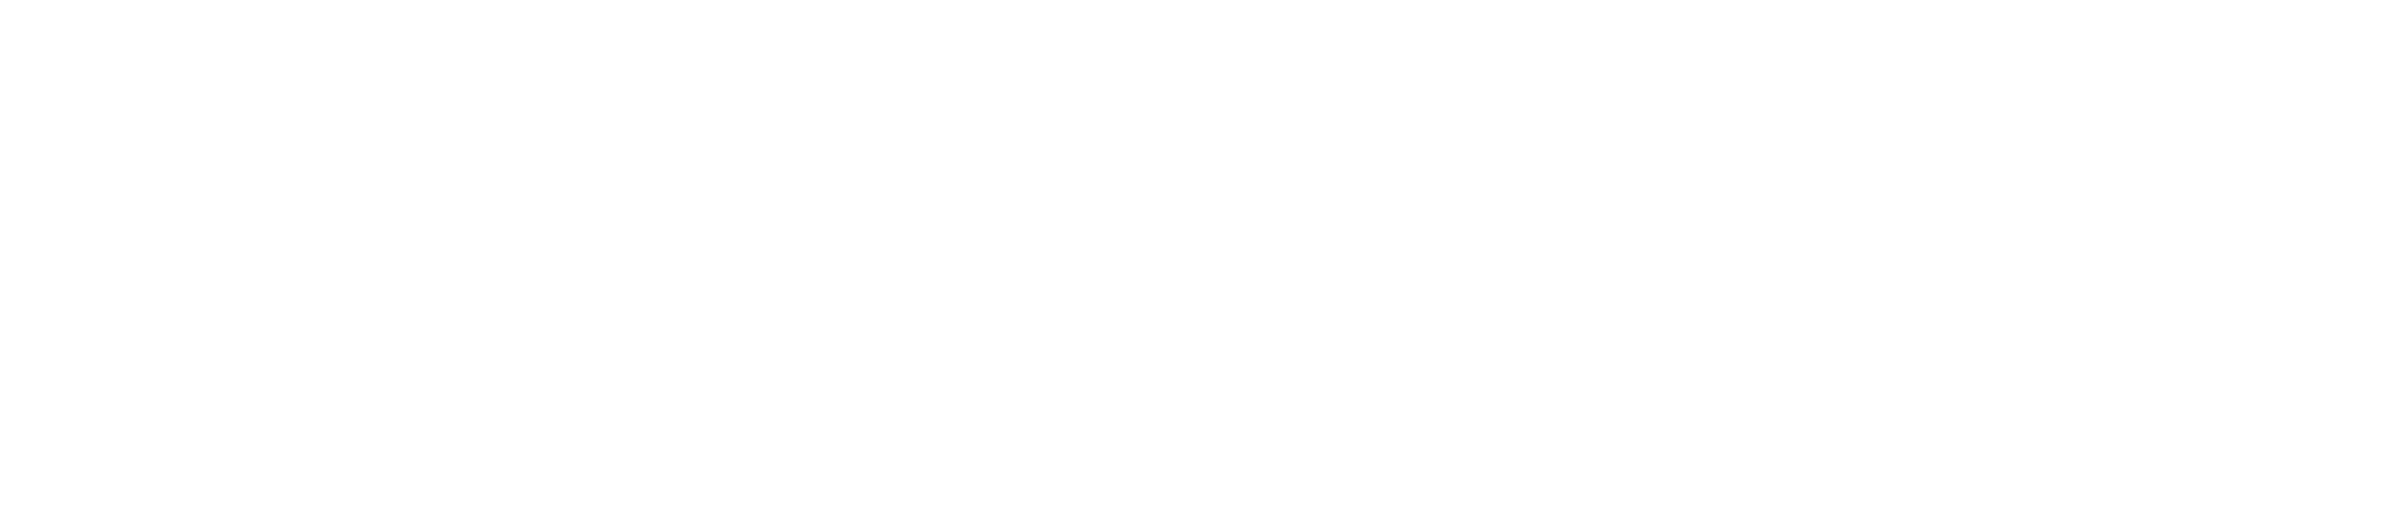 logo-black-and-white